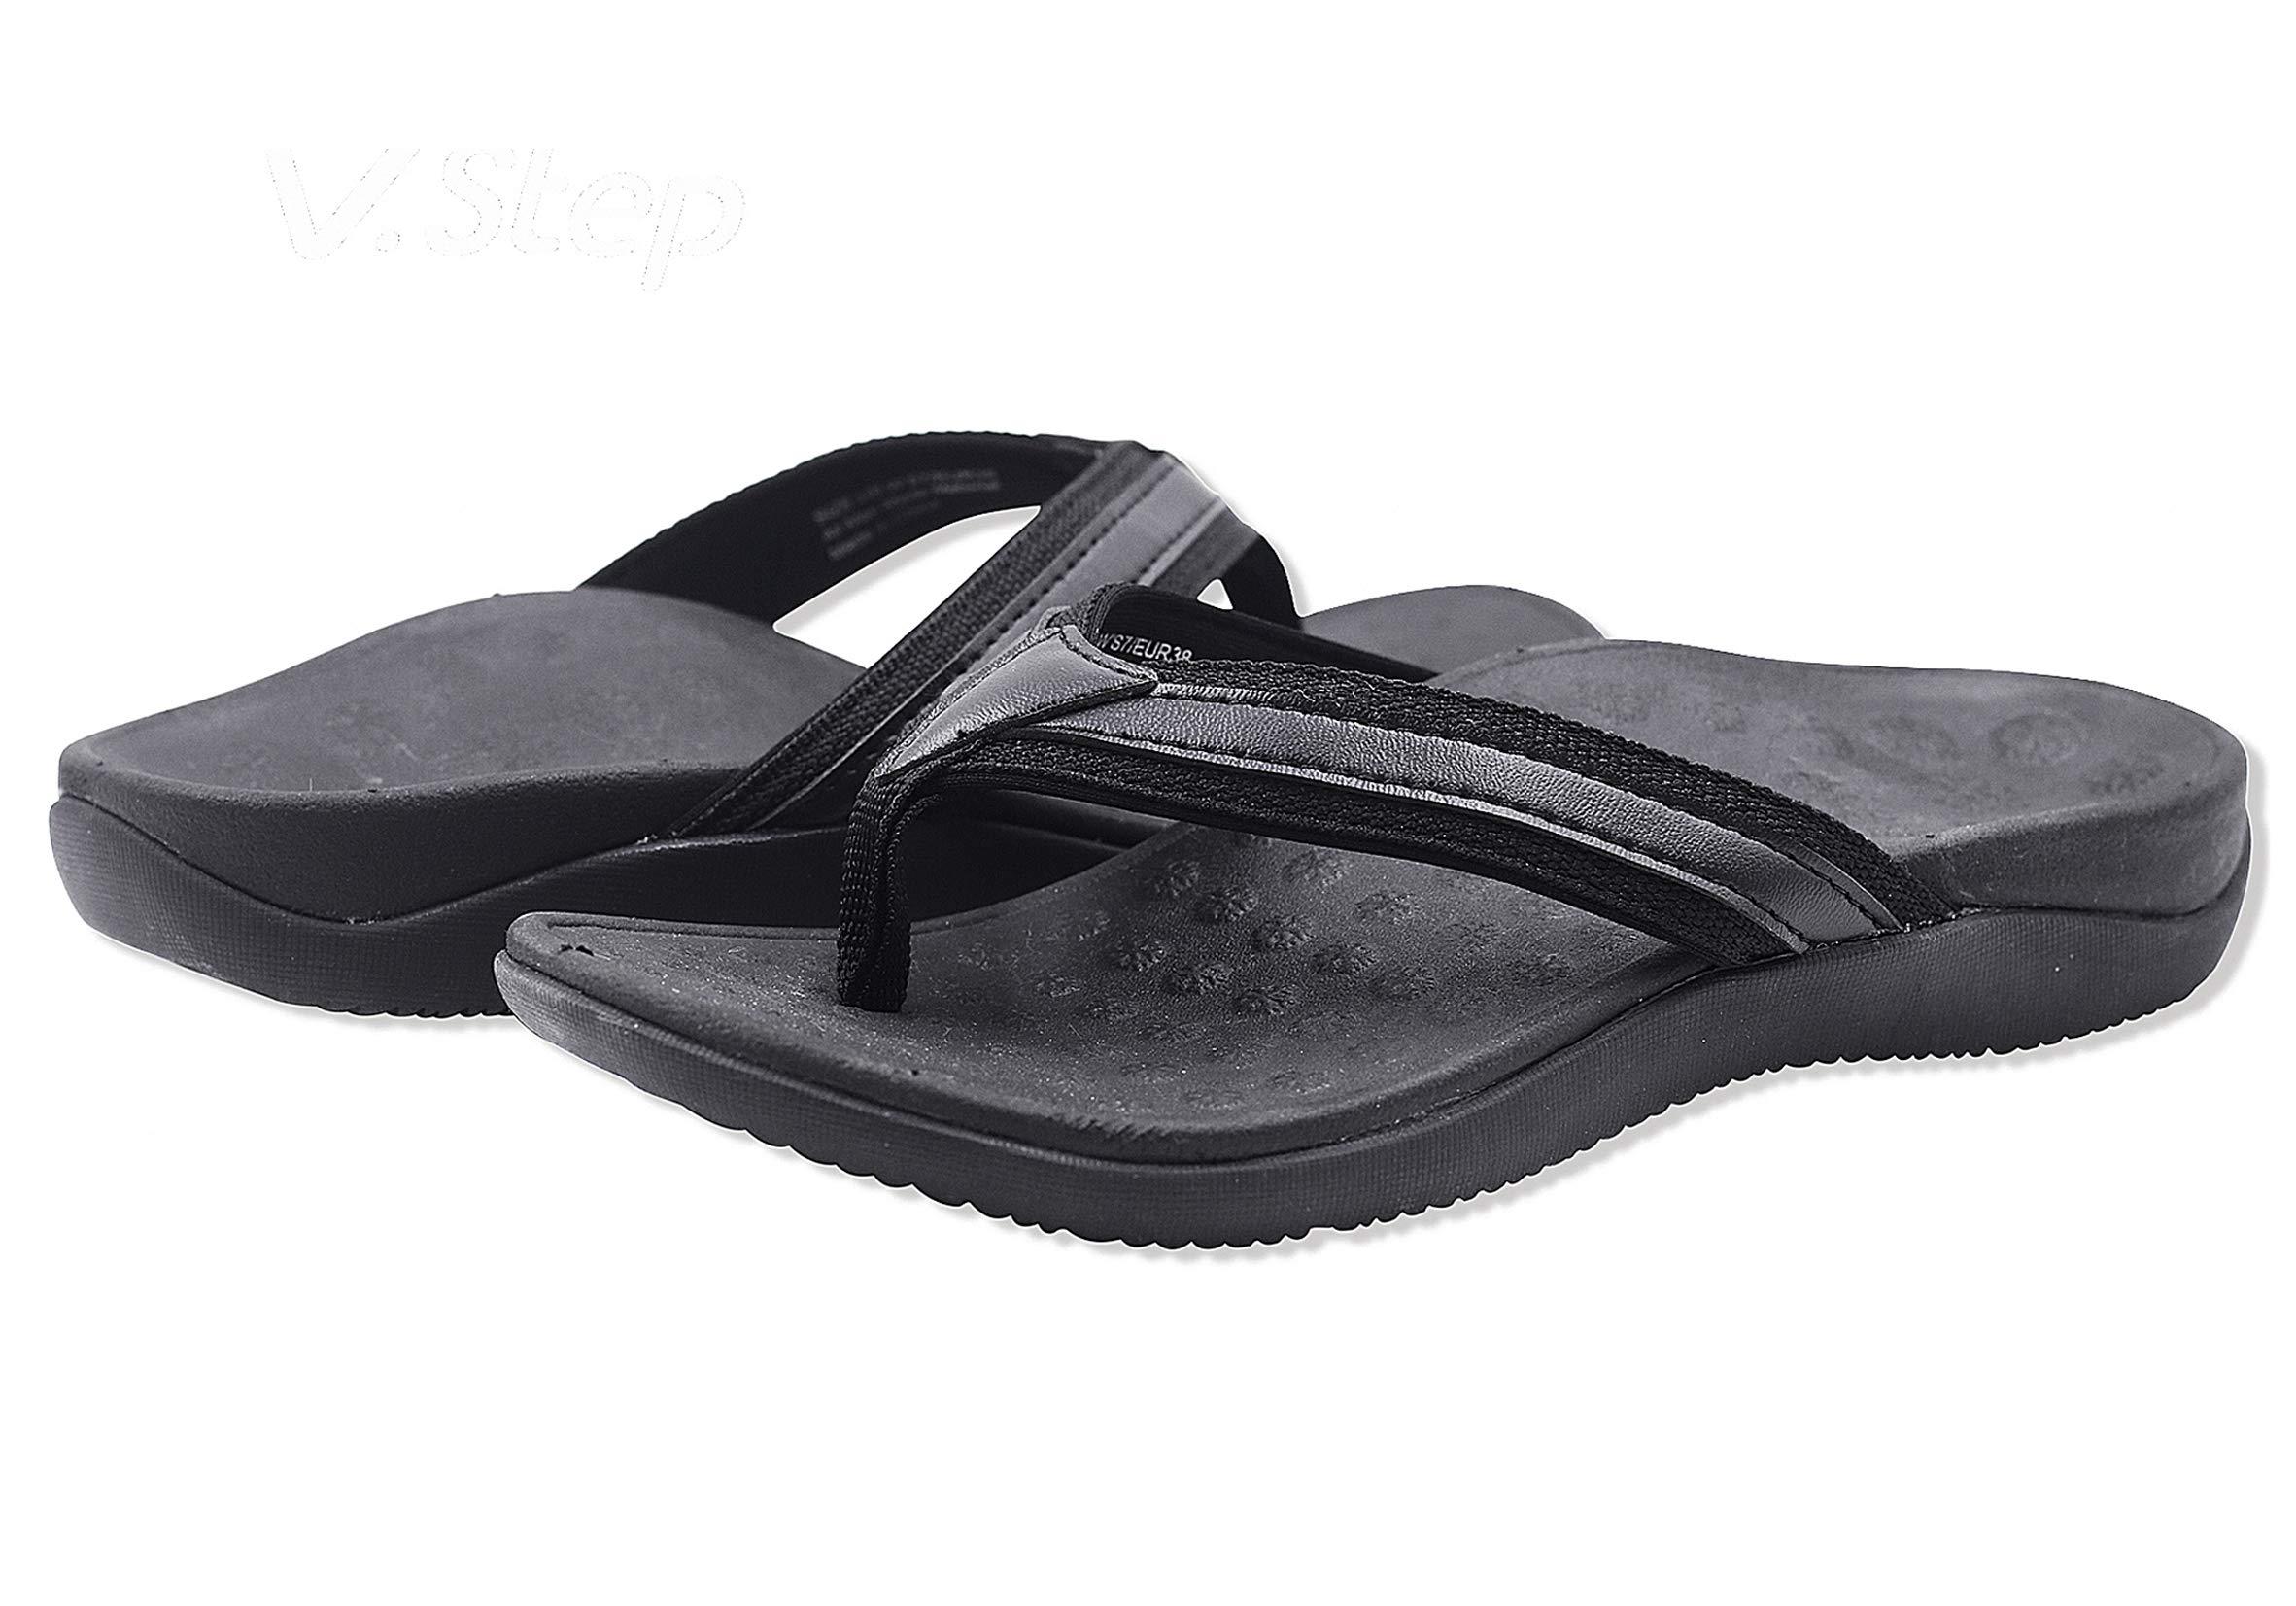 V.Step Flipthotics Orthotic Sandals - Arch Support, Metatarsal Riser & Heel Cup Prevent Foot Pain Black